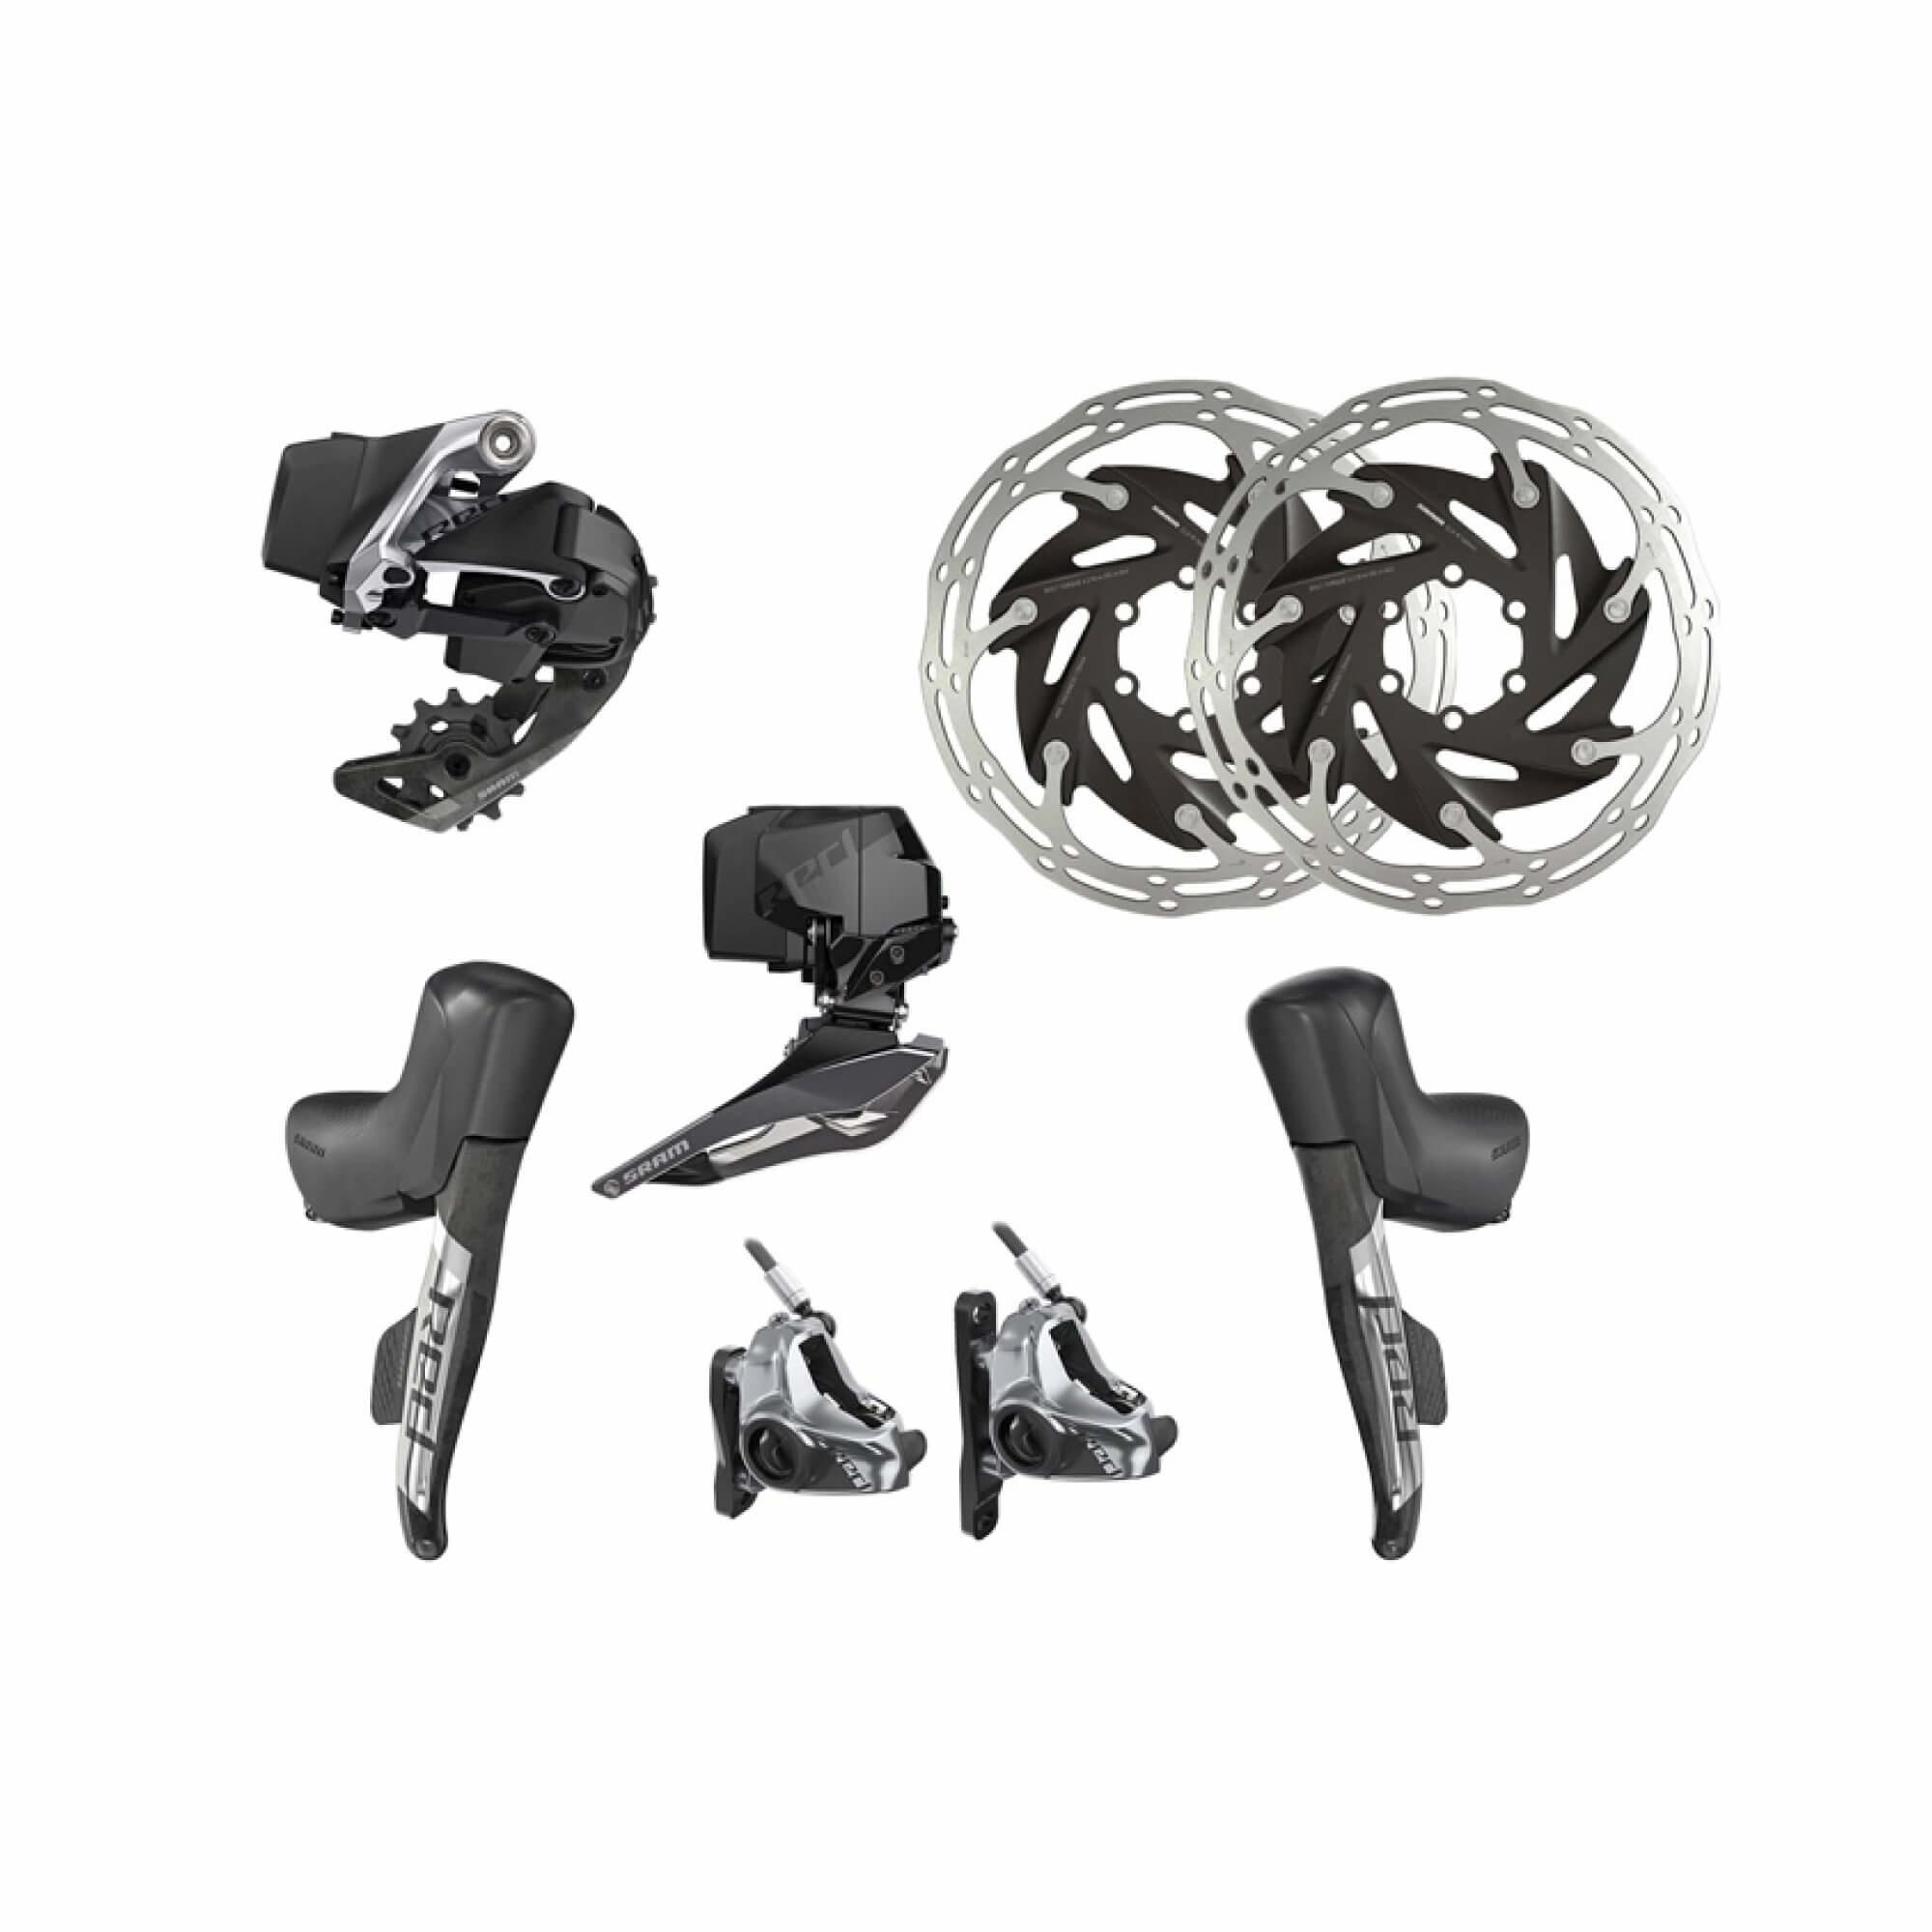 RED eTap AXS Upgrade Kit 2x Hydraulic 6 Bolt Disc Brake  Flat Mount-1